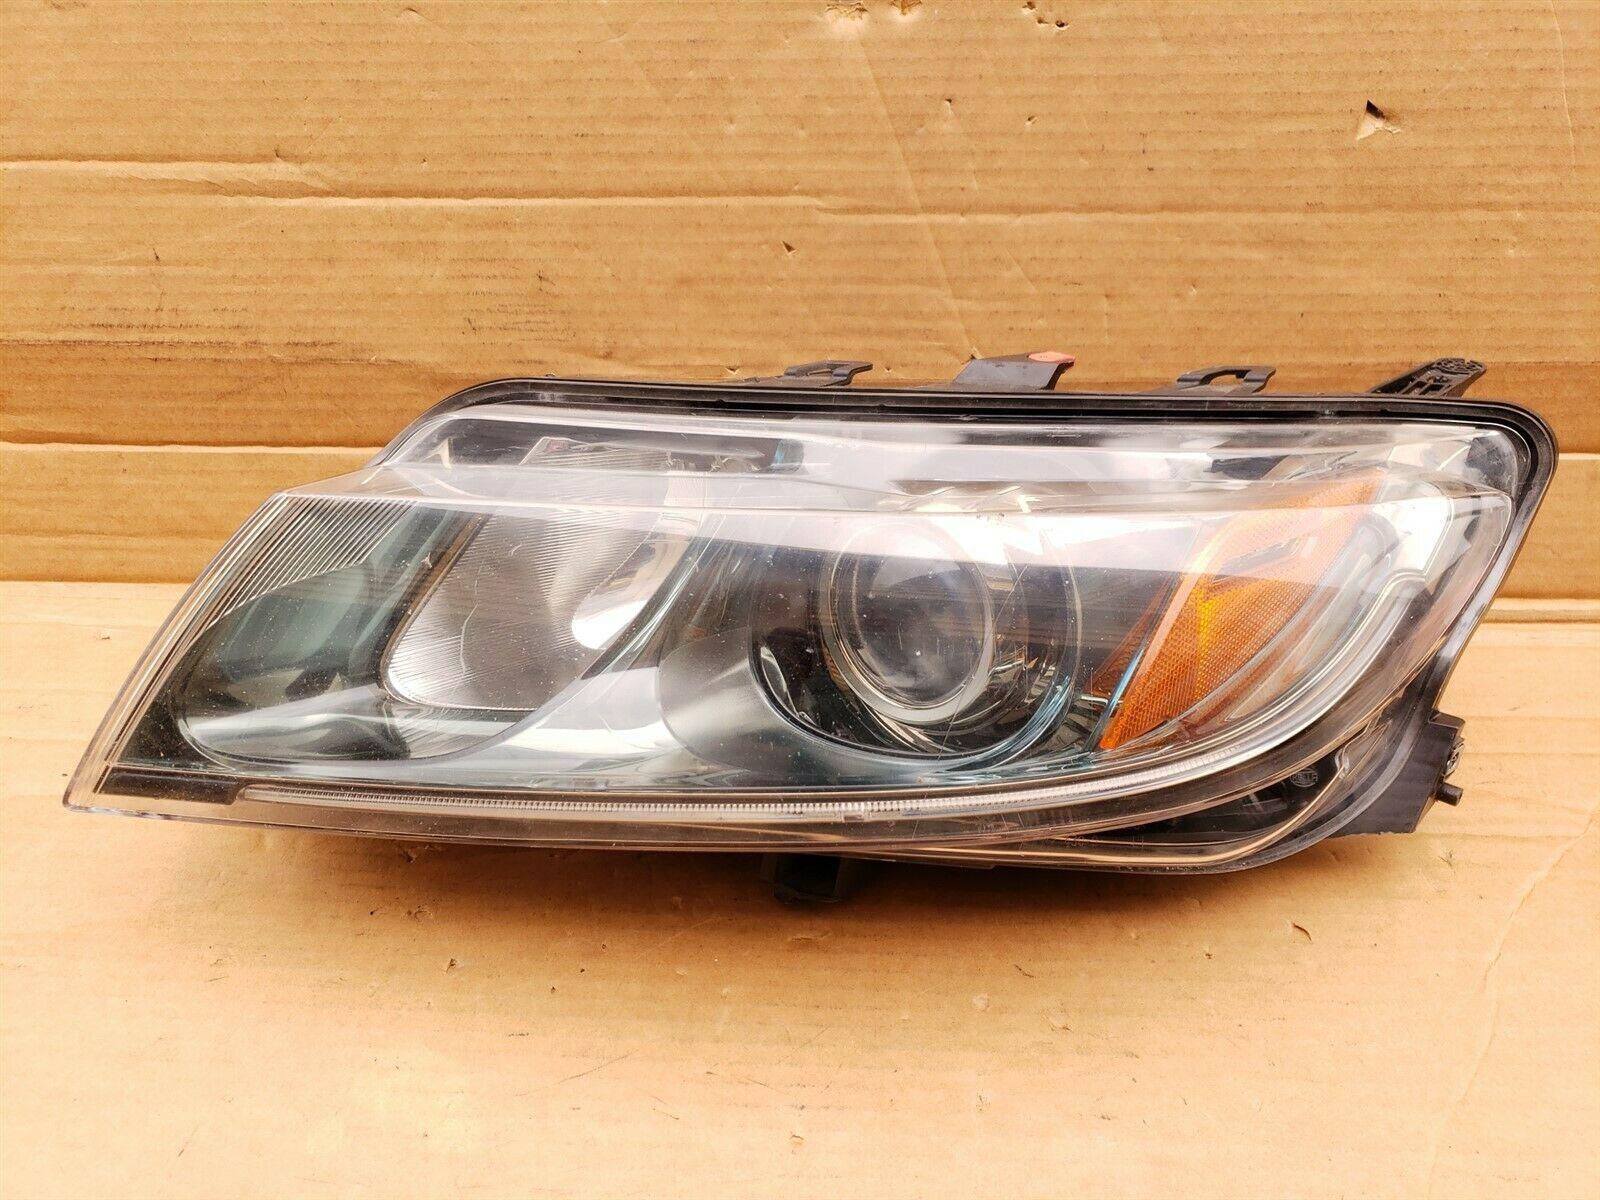 2010-11 Saab 9-5 YS3G Halogen Headlight Lamp Left Driver Side - LH